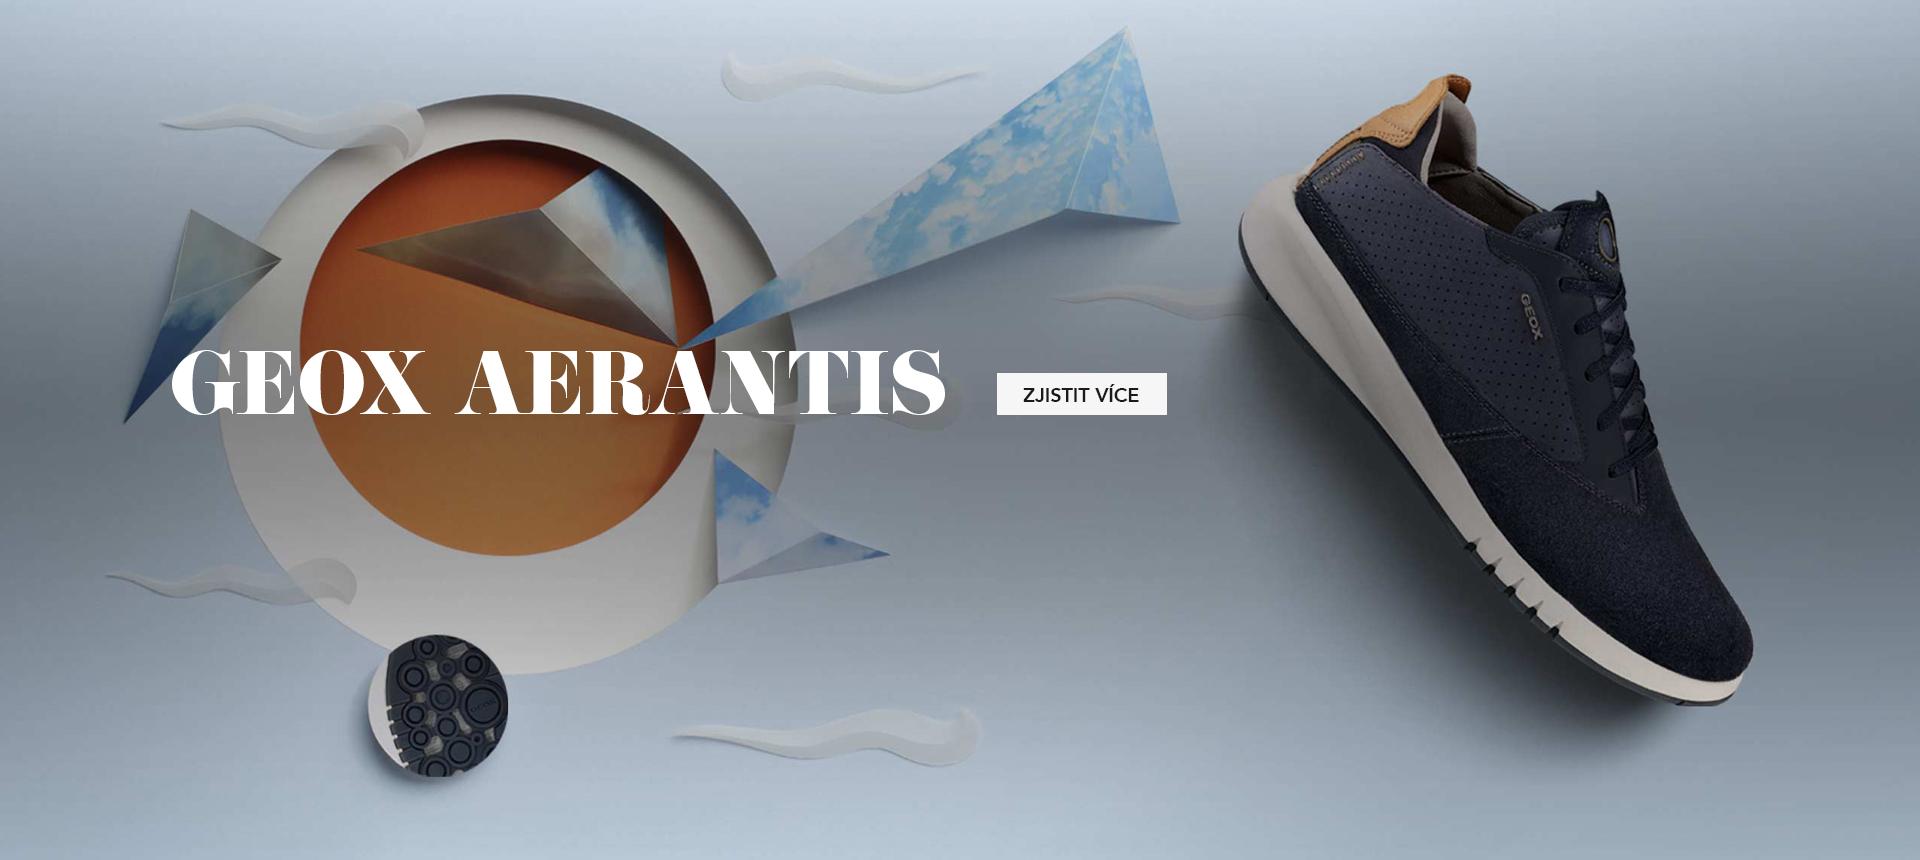 geox aerantis